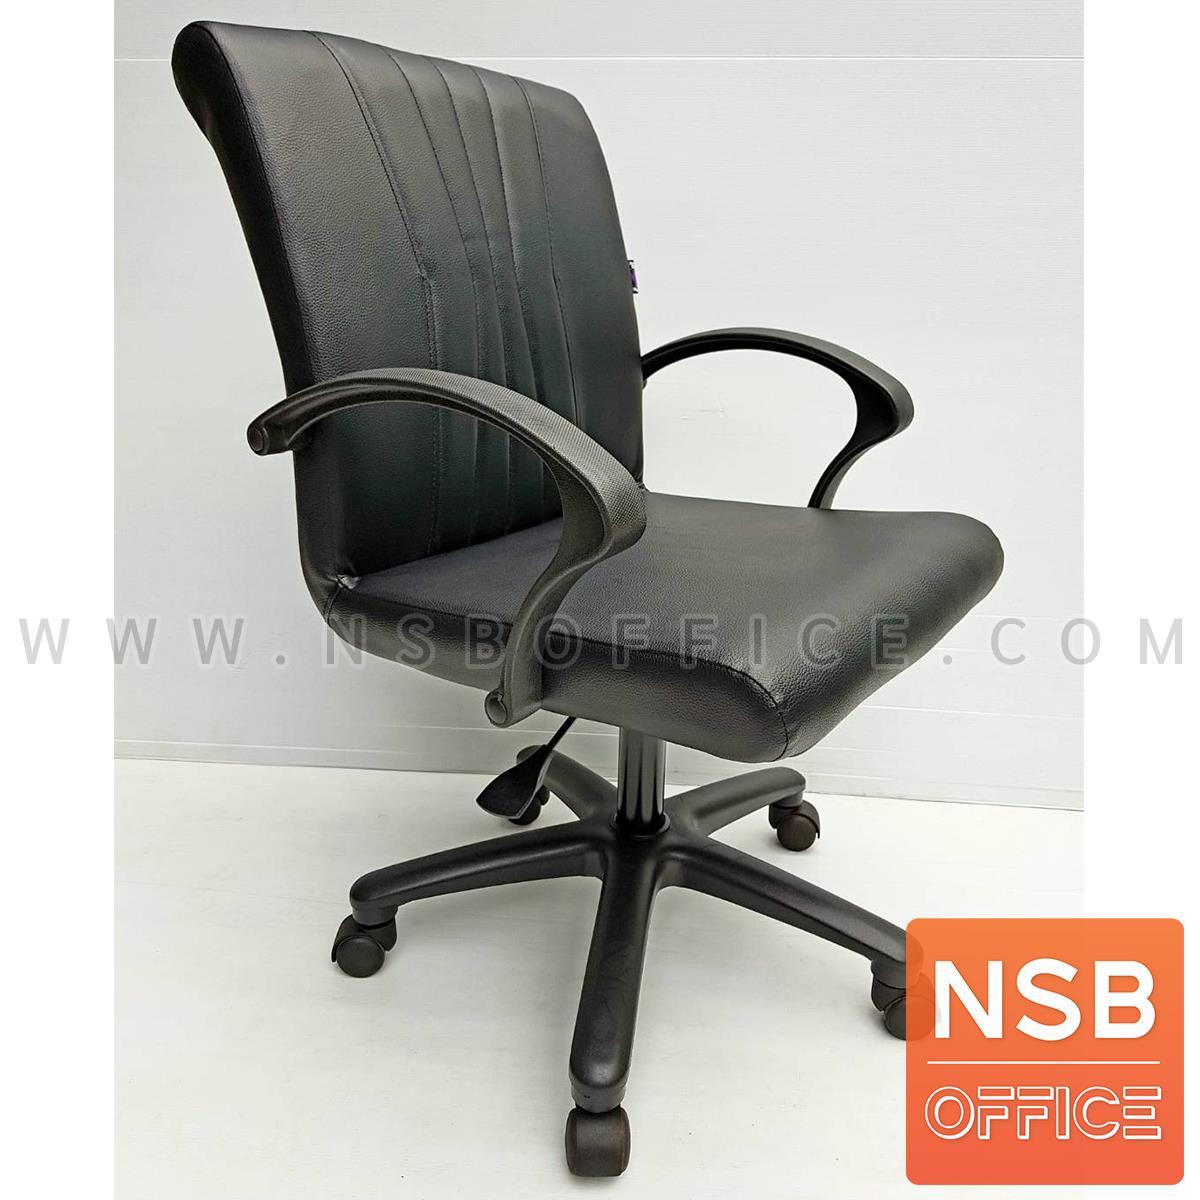 B26A148:เก้าอี้สำนักงาน รุ่น Blackscape  โช็คแก๊ส ขาพลาสติก